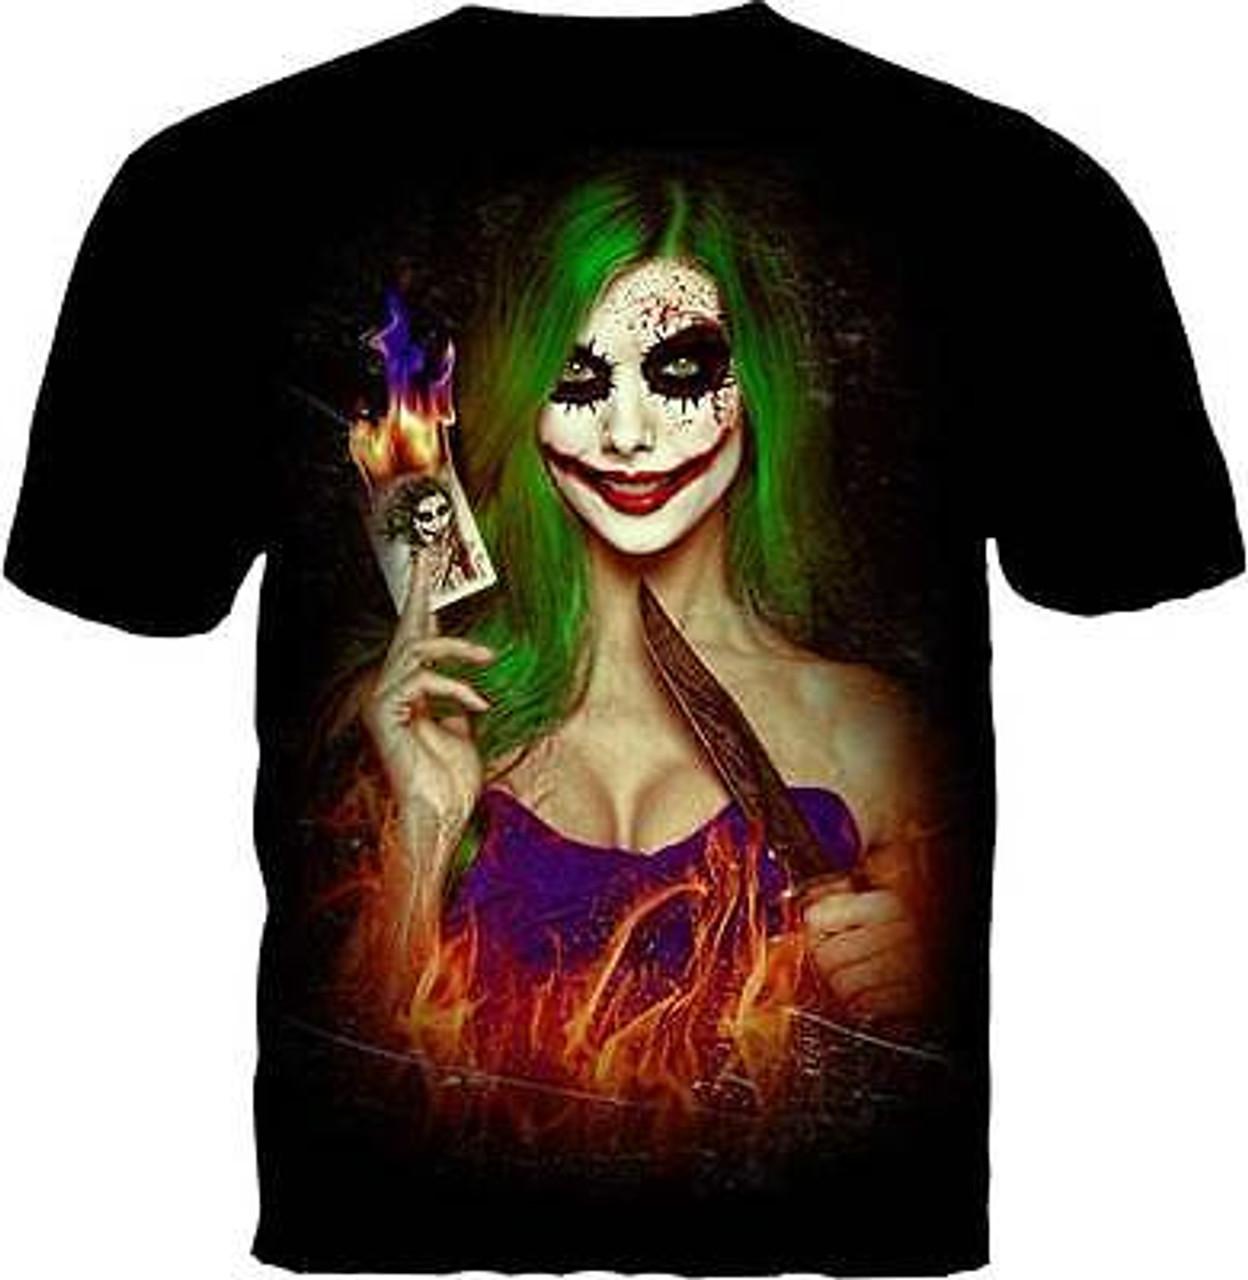 8f61ccc300bb9 Daveed Benito Chaos Female Joker Cards Knife Blood Comics Artwork Tee Shirt